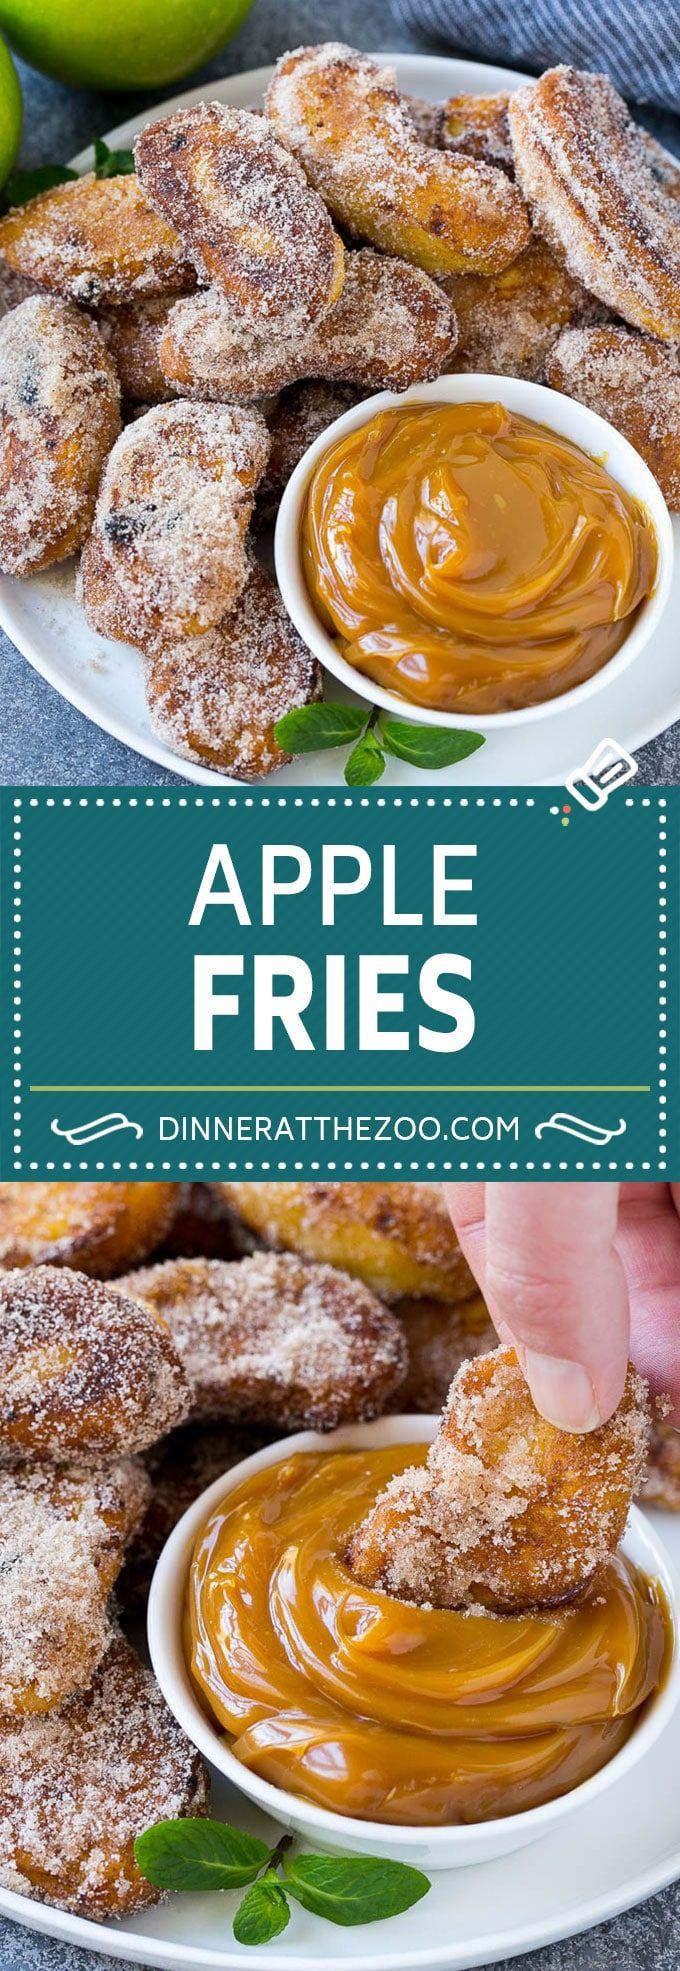 Apple Fries Recipe | Fried Apples Recipe | Cinnamon Sugar Apples | Apple Dessert Recipe